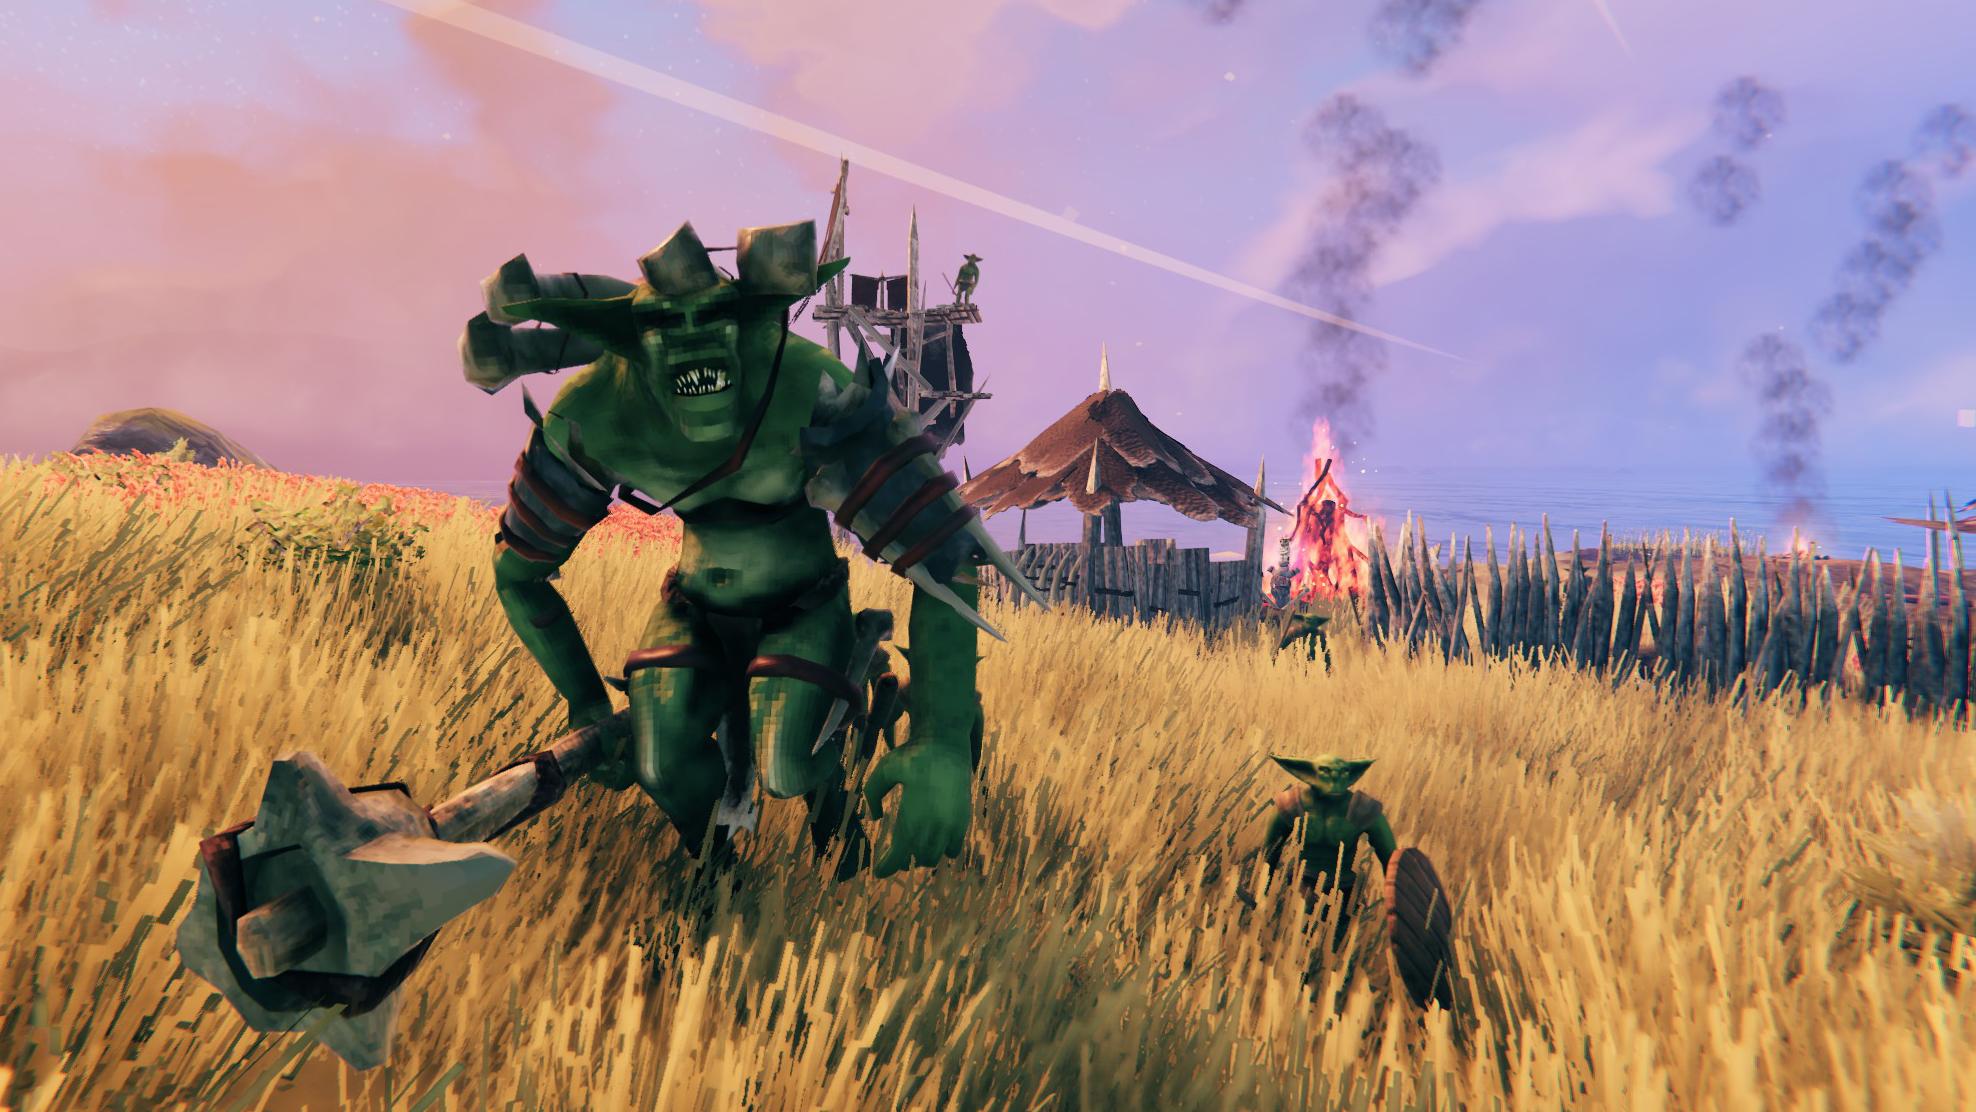 Valheim developer says Zelda and Skyrim were bigger influences than survival games